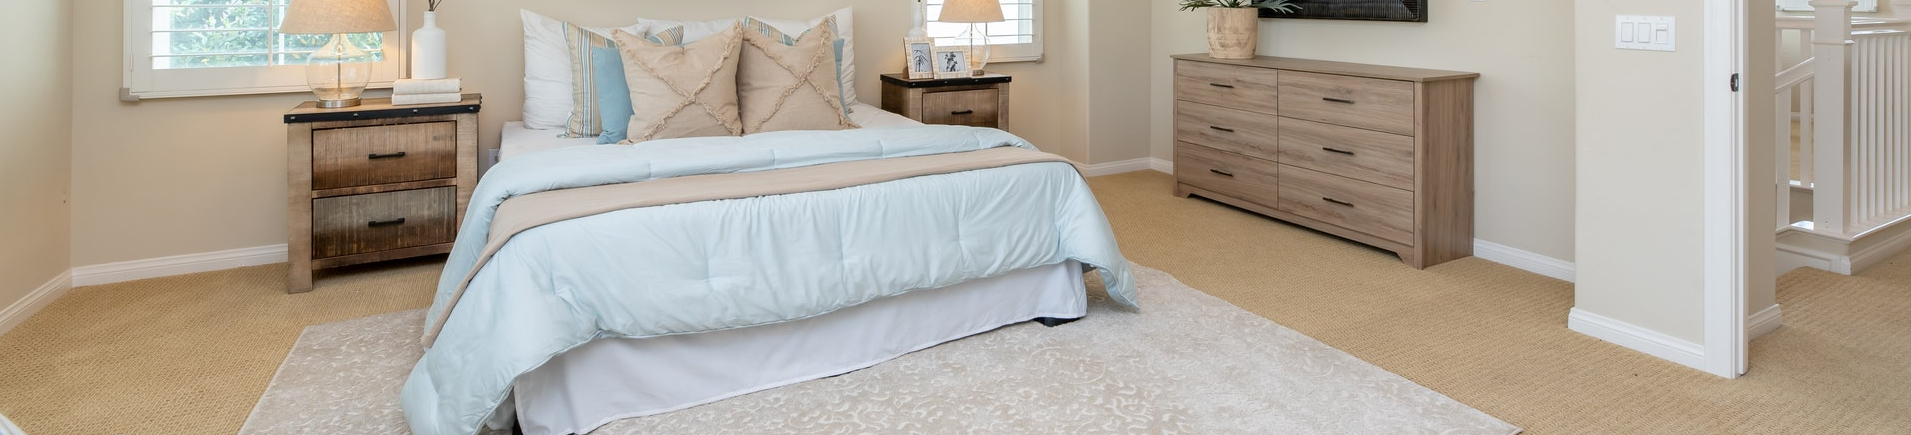 free bedbug inspections